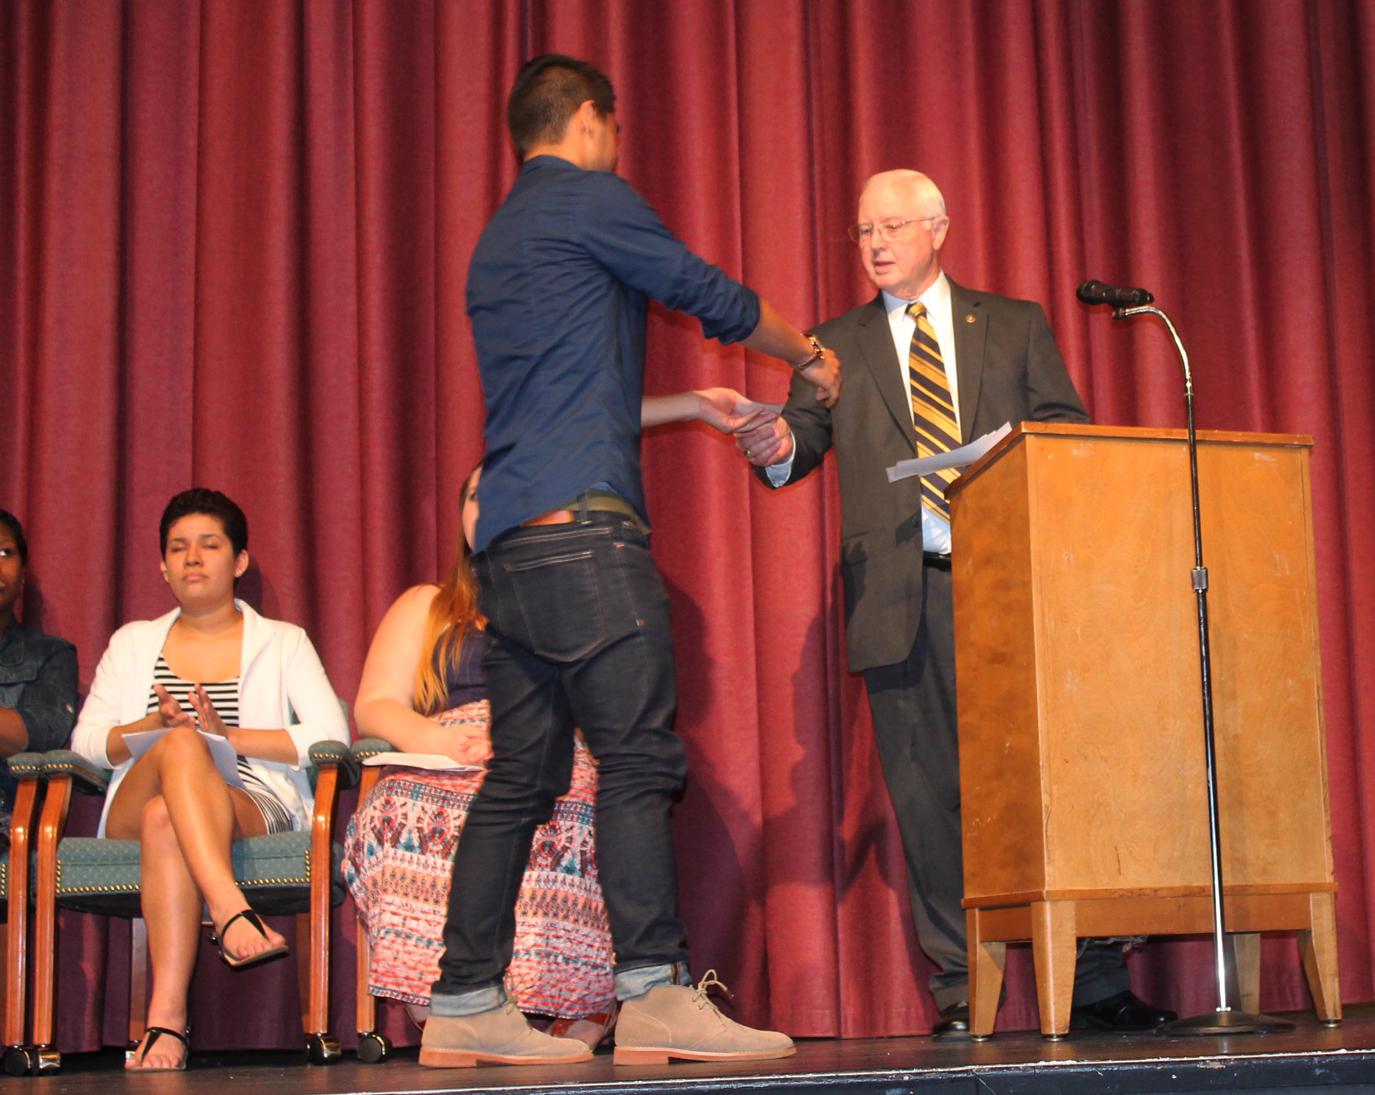 Thomas Edison High School of Technology Awards Assembly